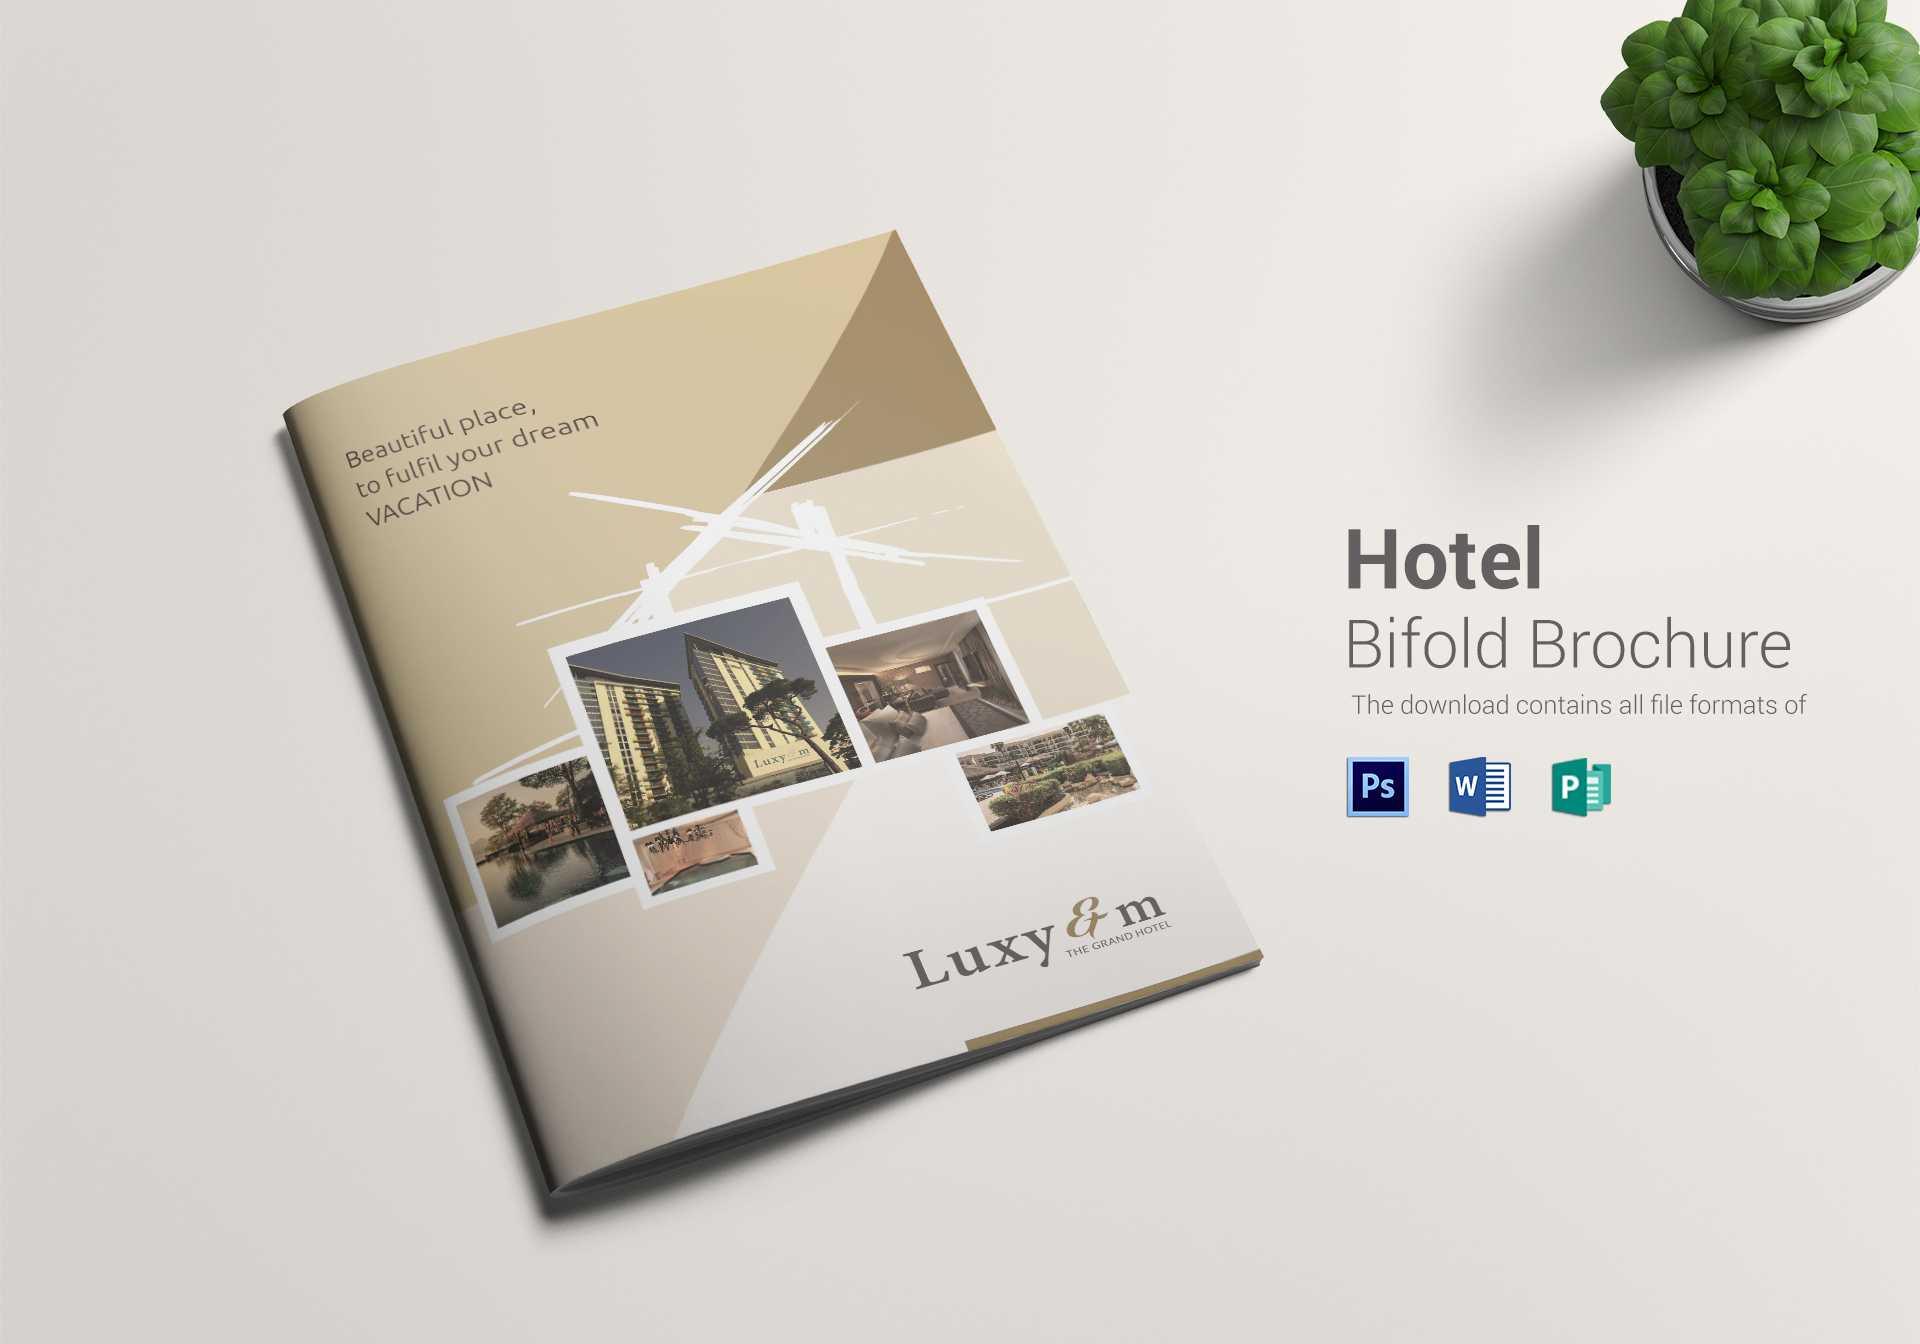 Hotel Bi Fold Brochure Template In Hotel Brochure Design Templates